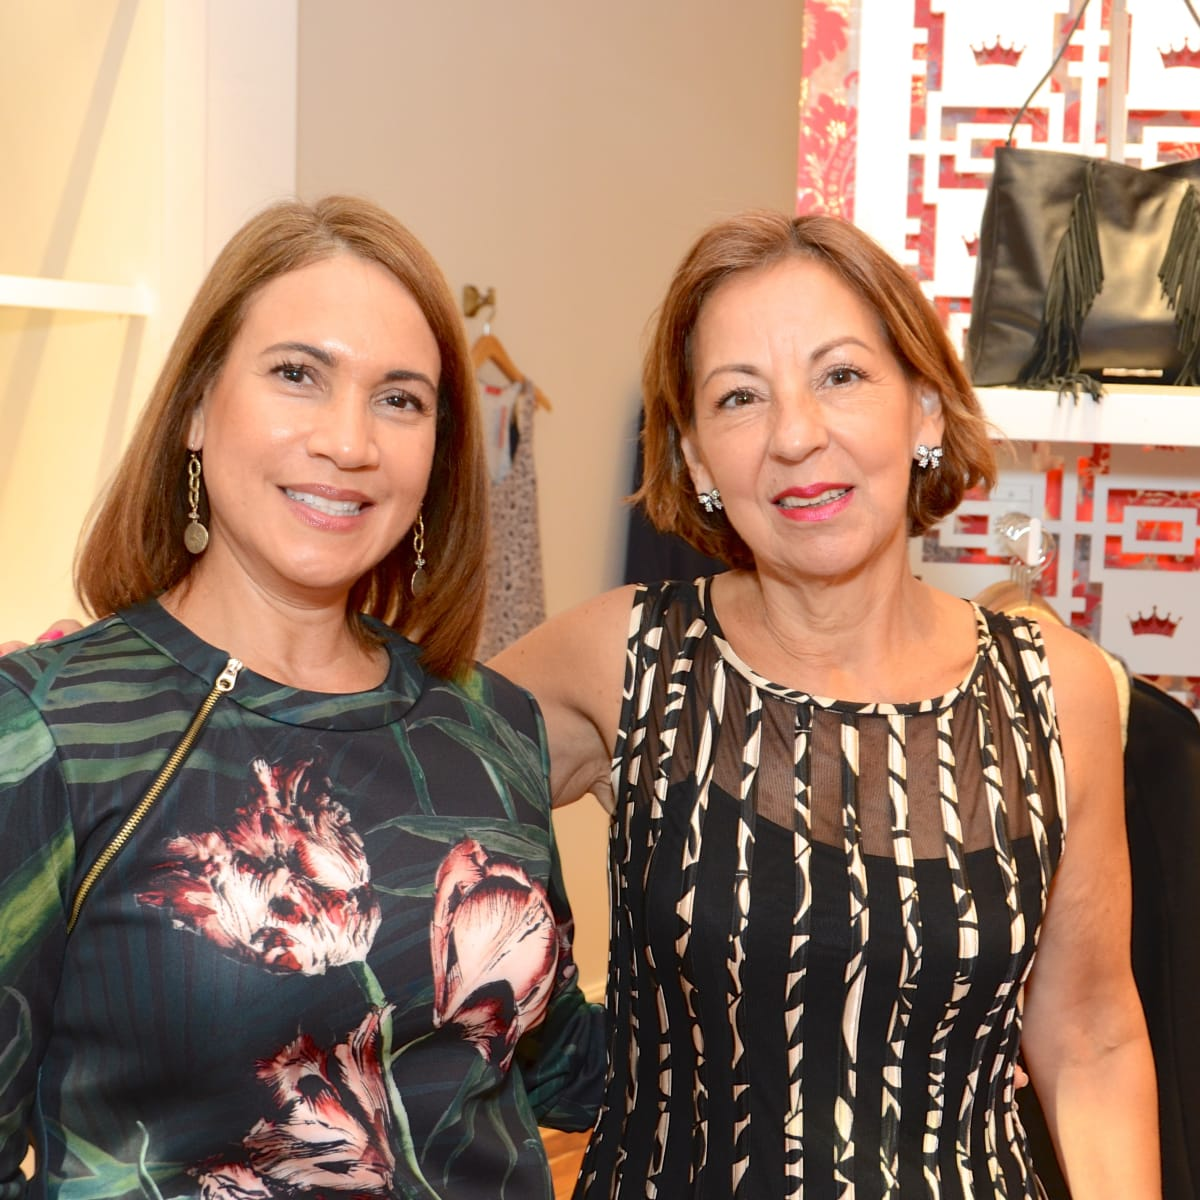 News, Shelby, Latin Women's Initiative party, Sept. 2015, Marilyn Greiner, Gloria Martinez